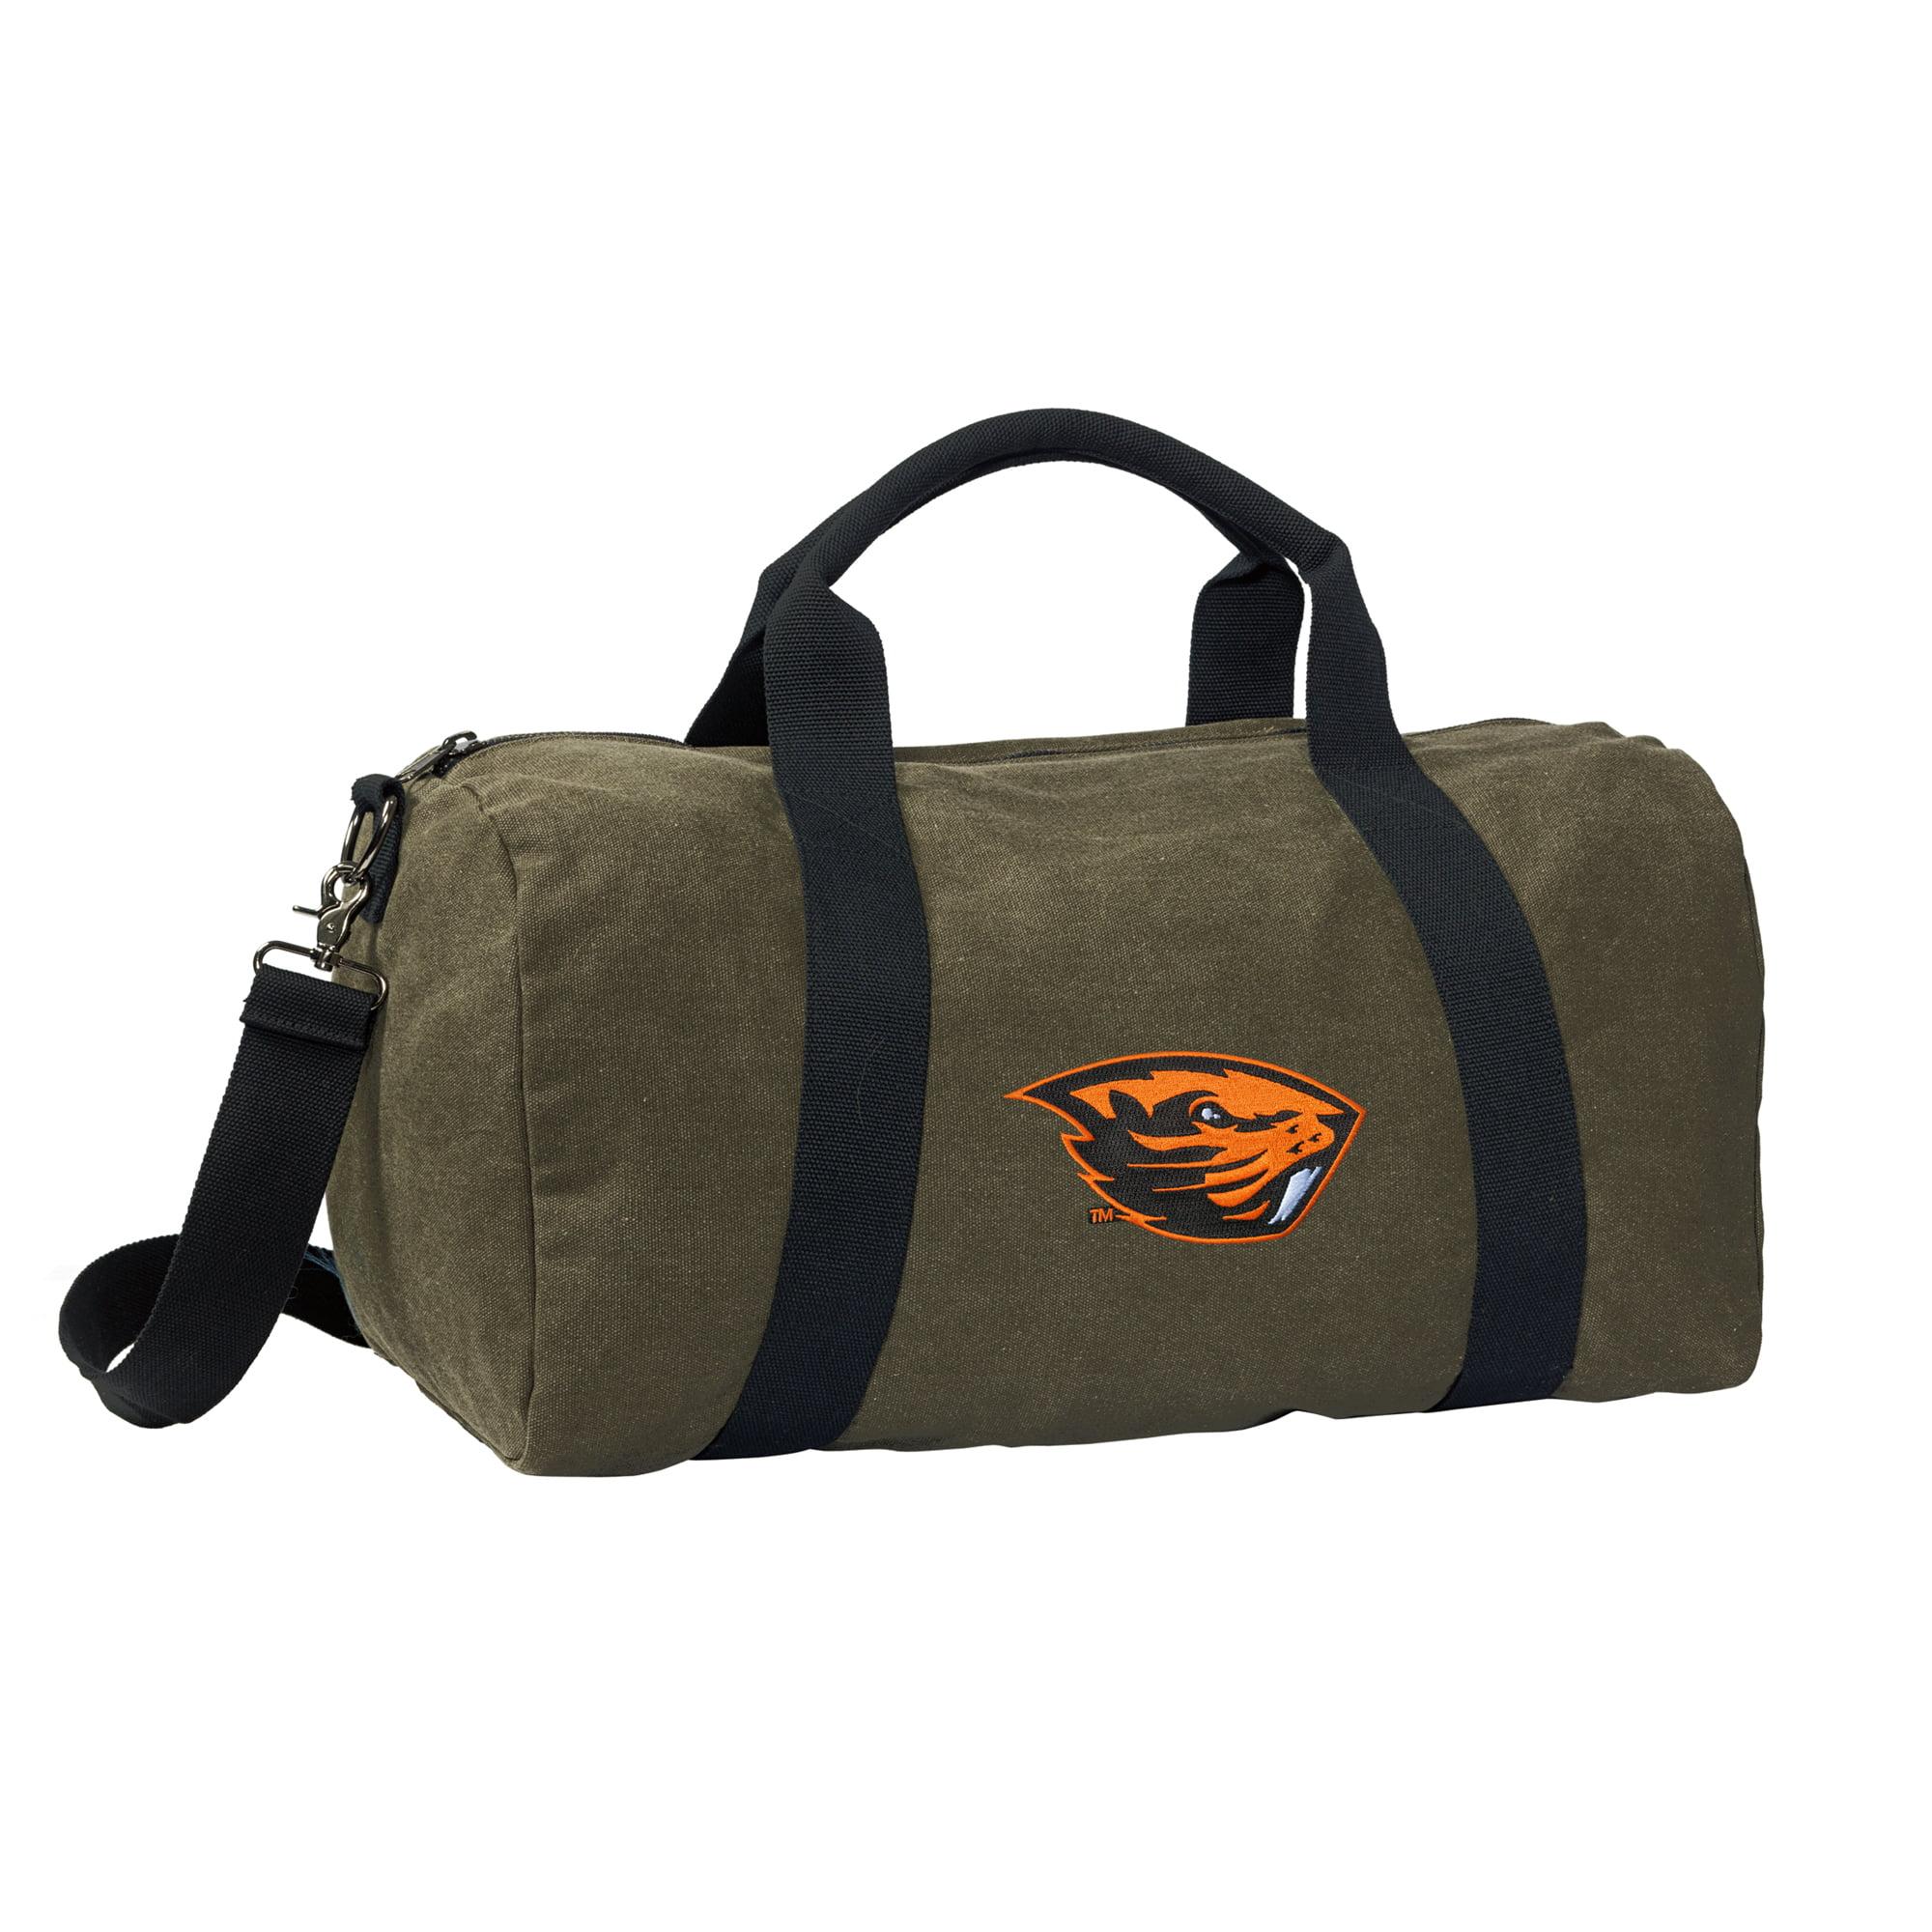 OSU Beavers Duffle Bag CANVAS Oregon State Luggage Bag by